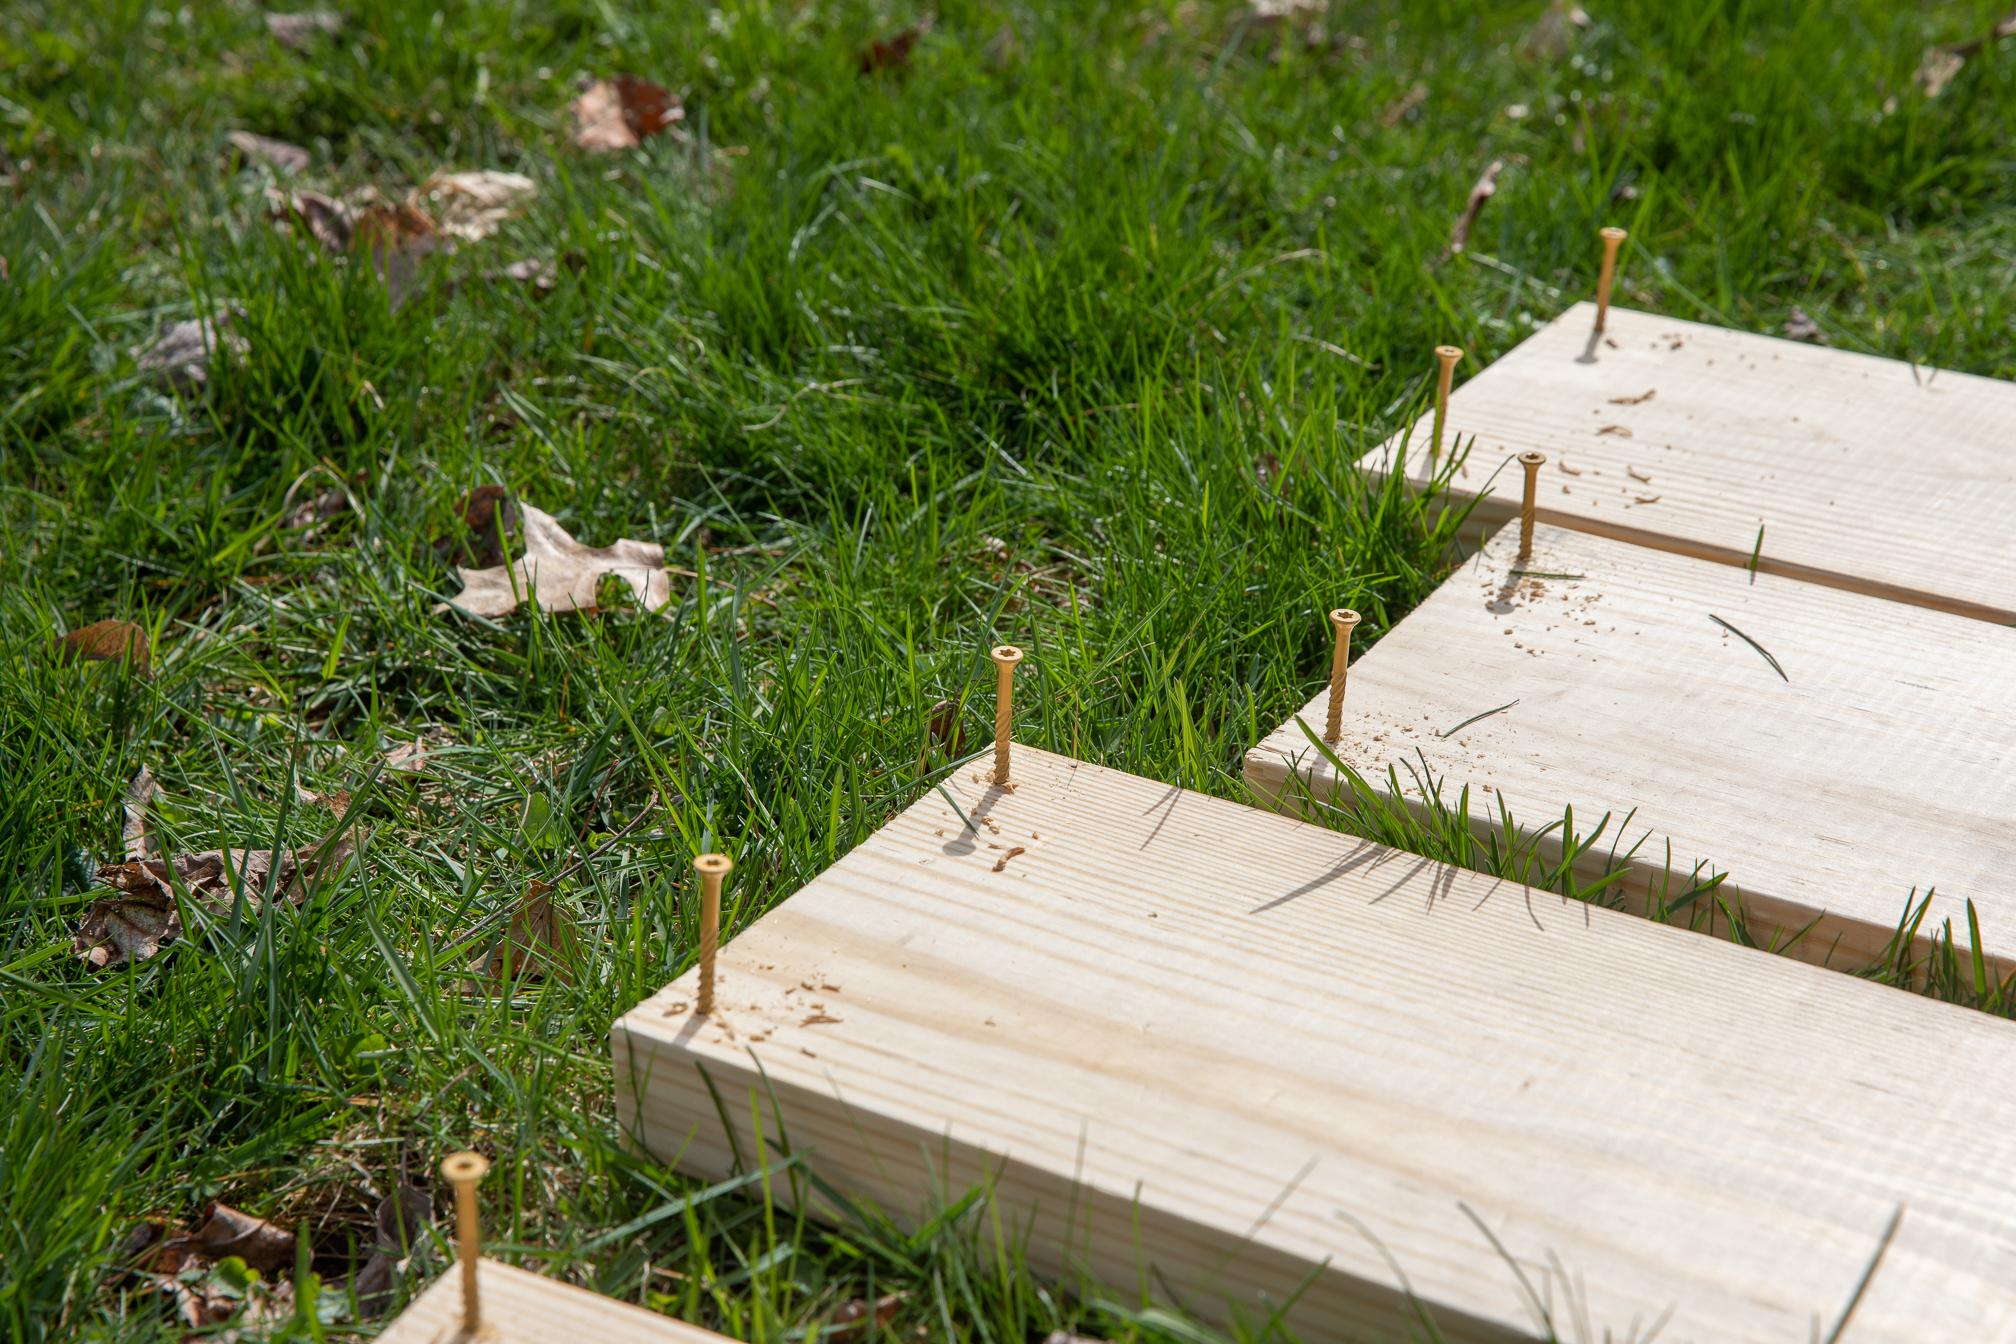 Garden Ideas   leavethesandwich.com #garden #harvest #growsomething